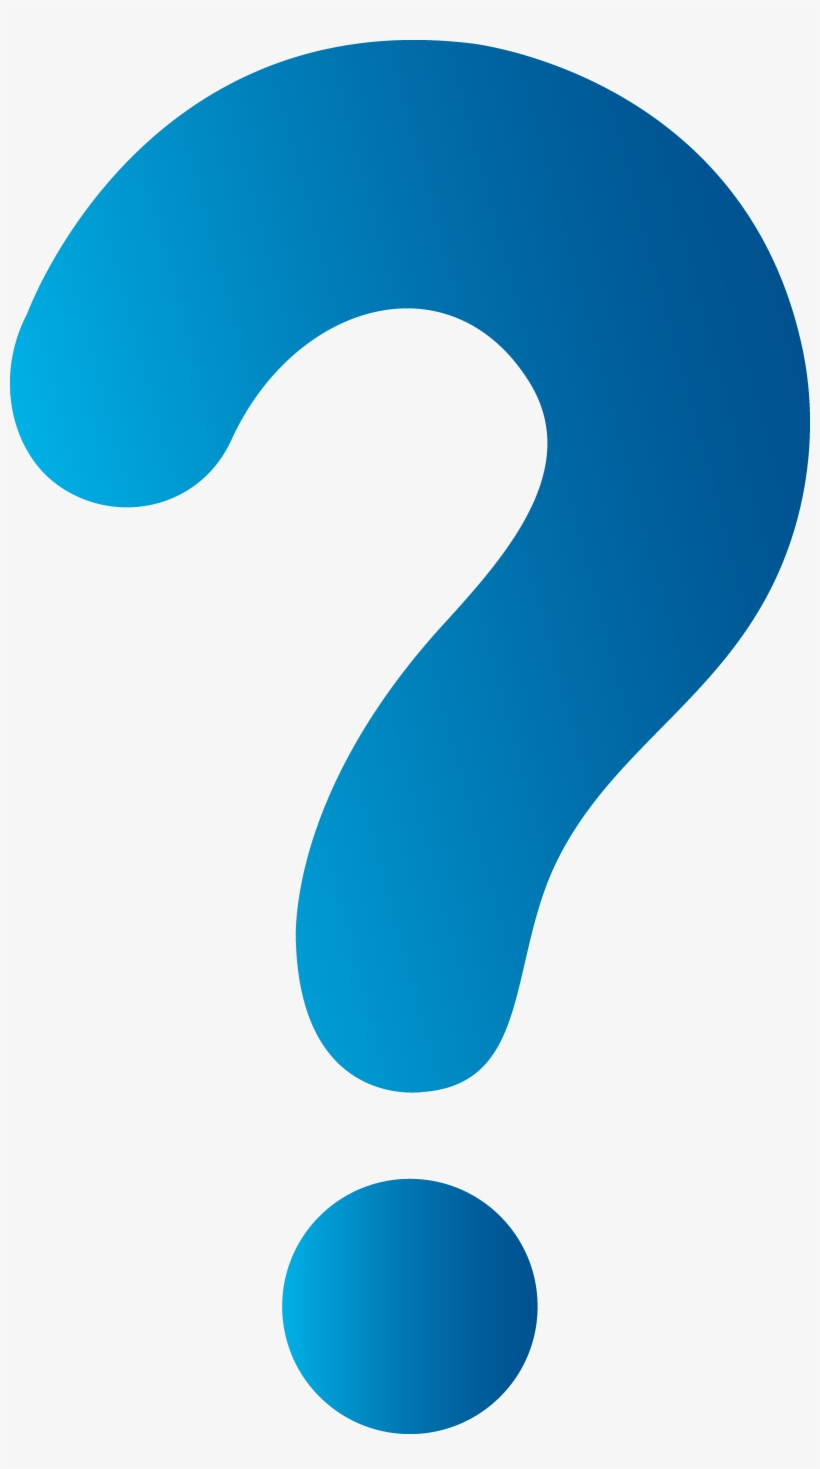 Question Mark Png - Blue Question Mark, transparent png #125599